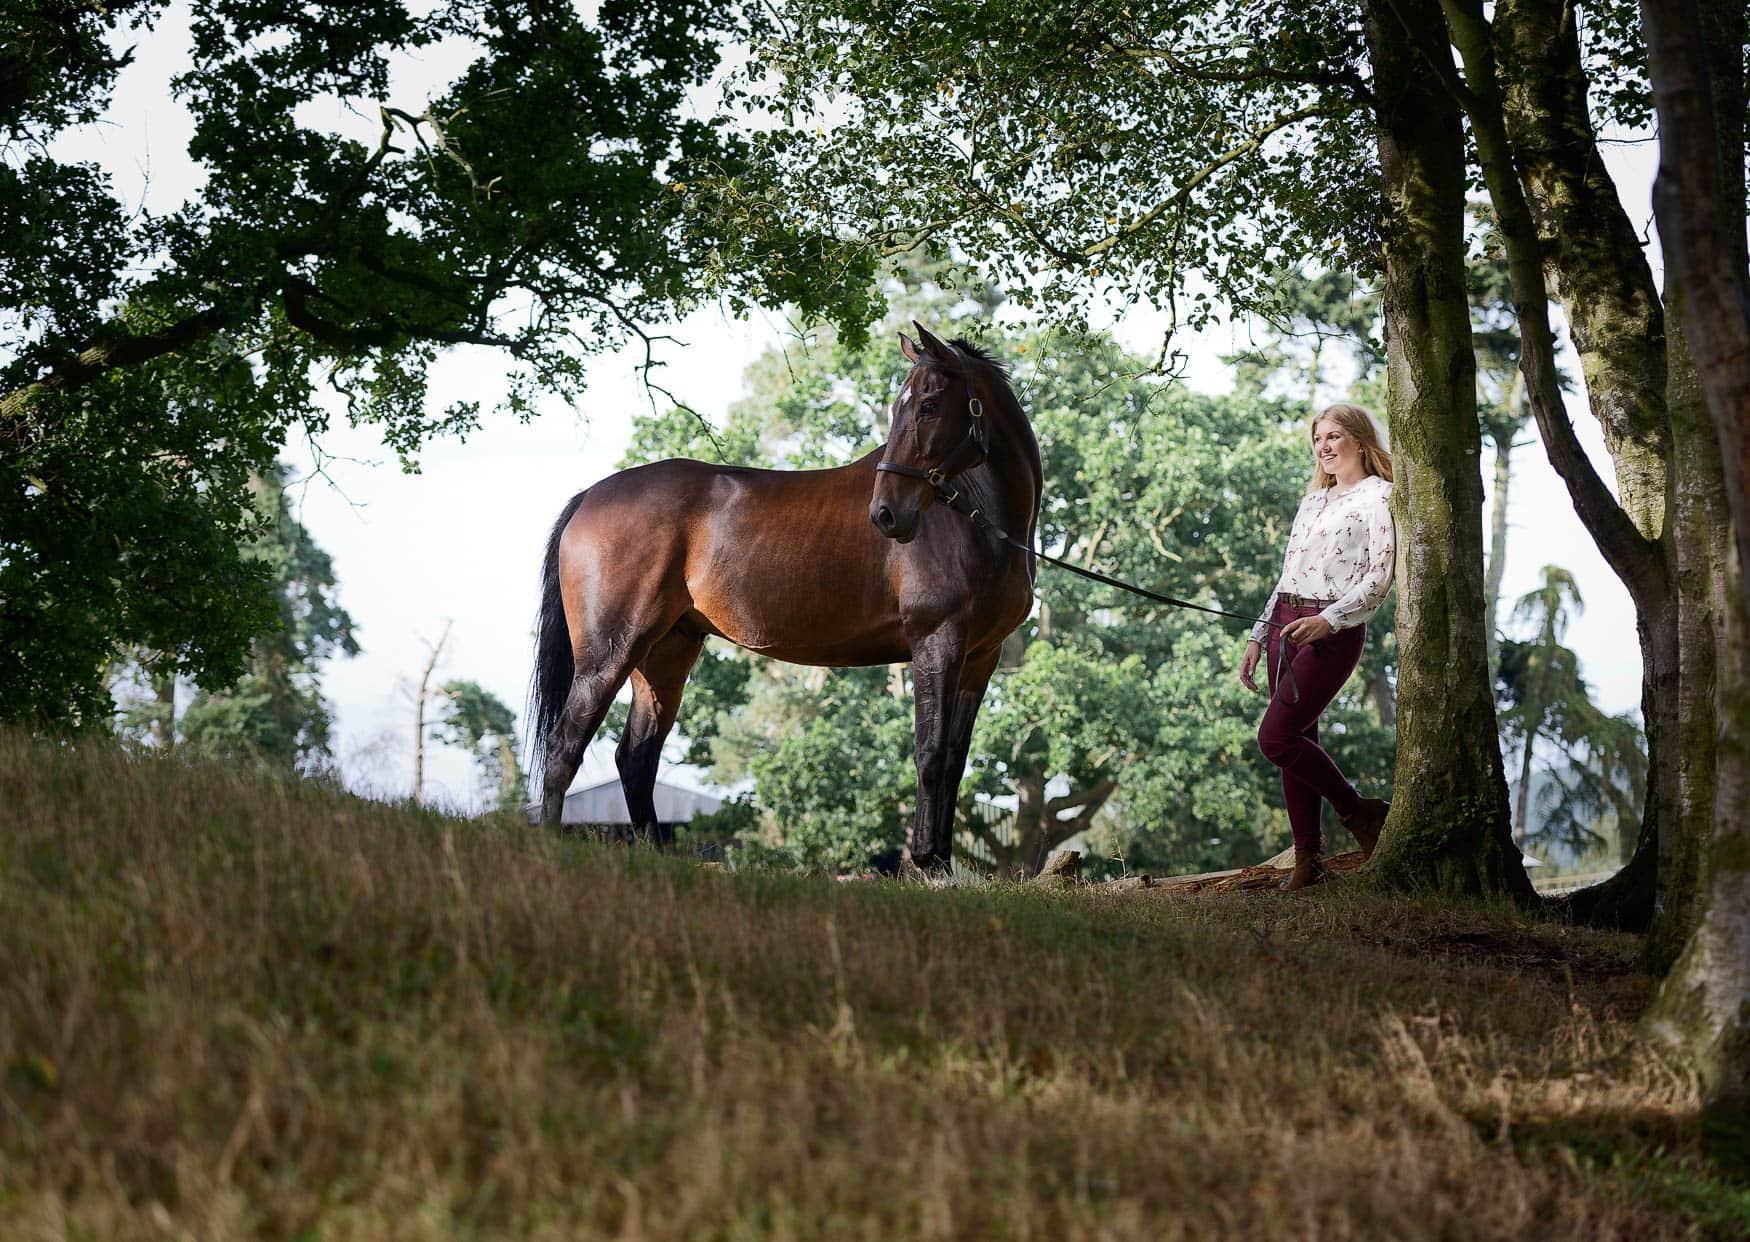 Eventing horse - Shropshire photographer